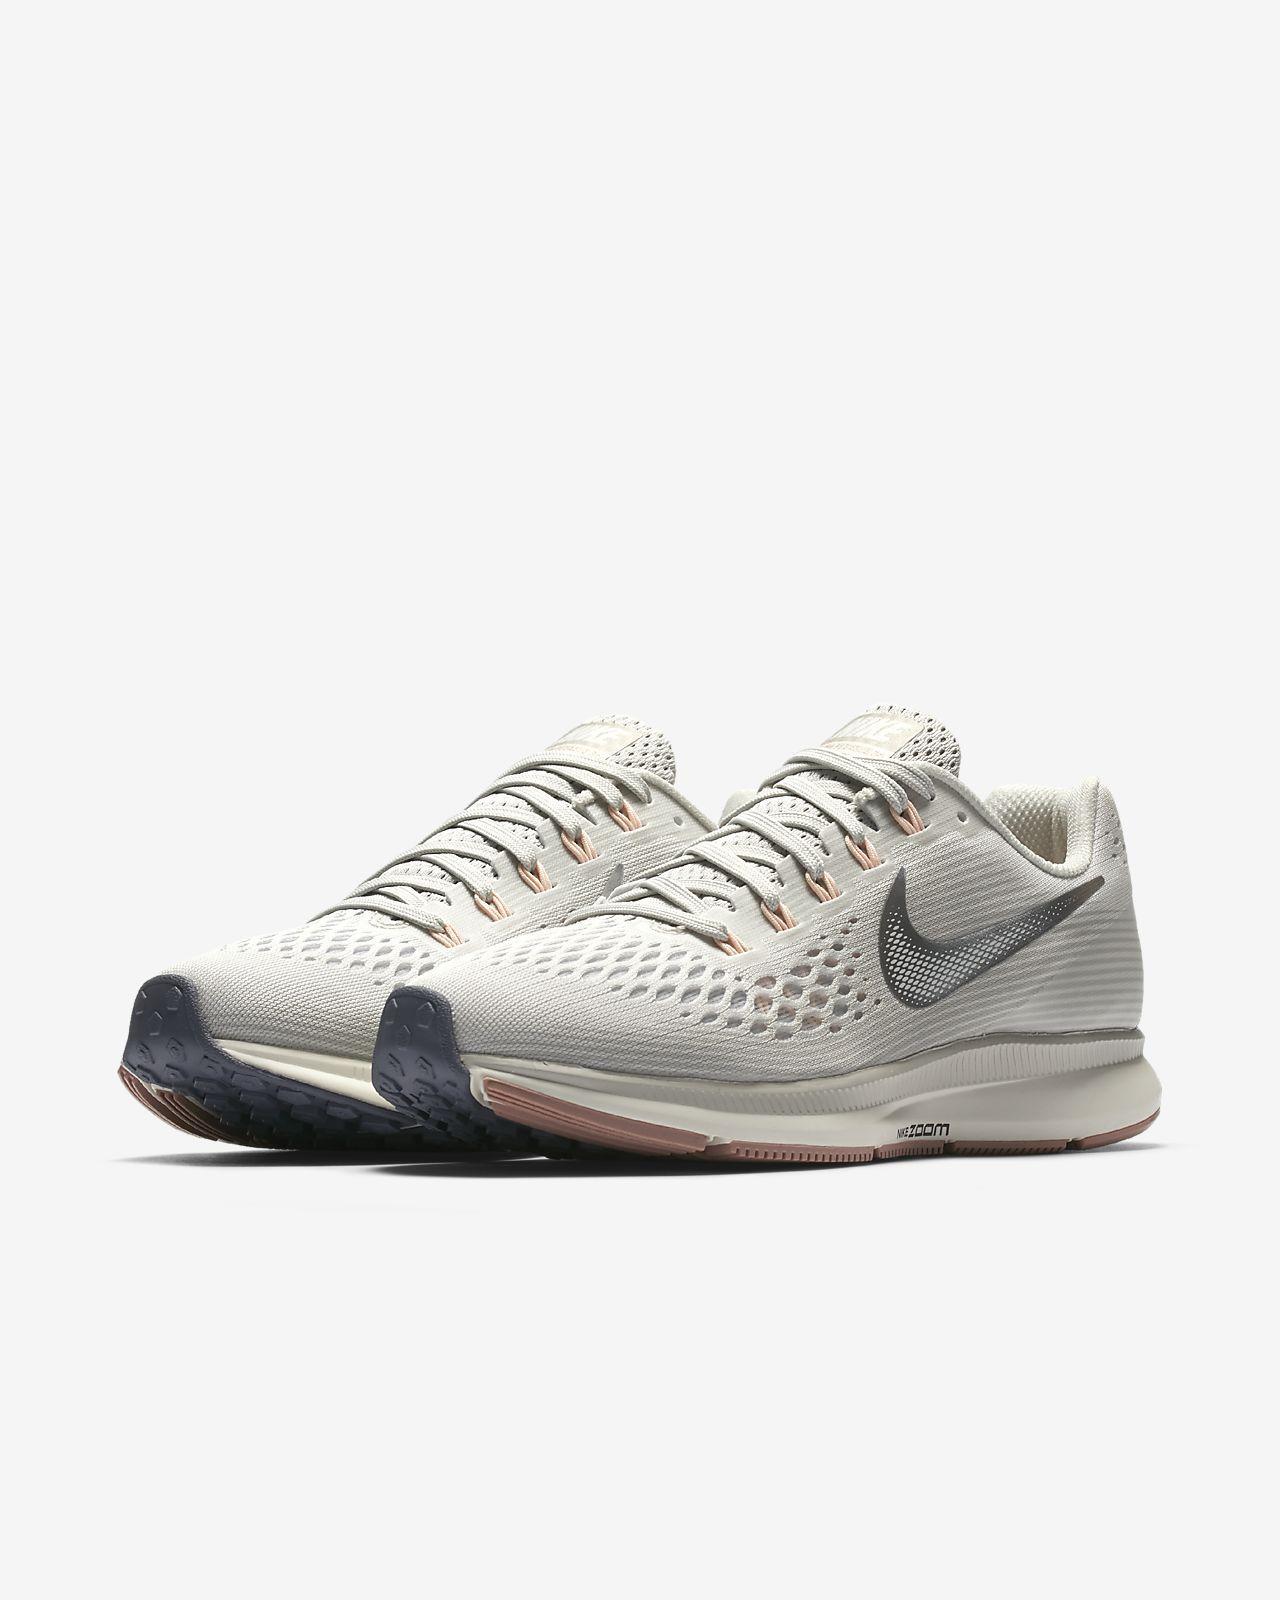 b26c0f628fe64 Nike Air Zoom Pegasus 34 Women s Running Shoe